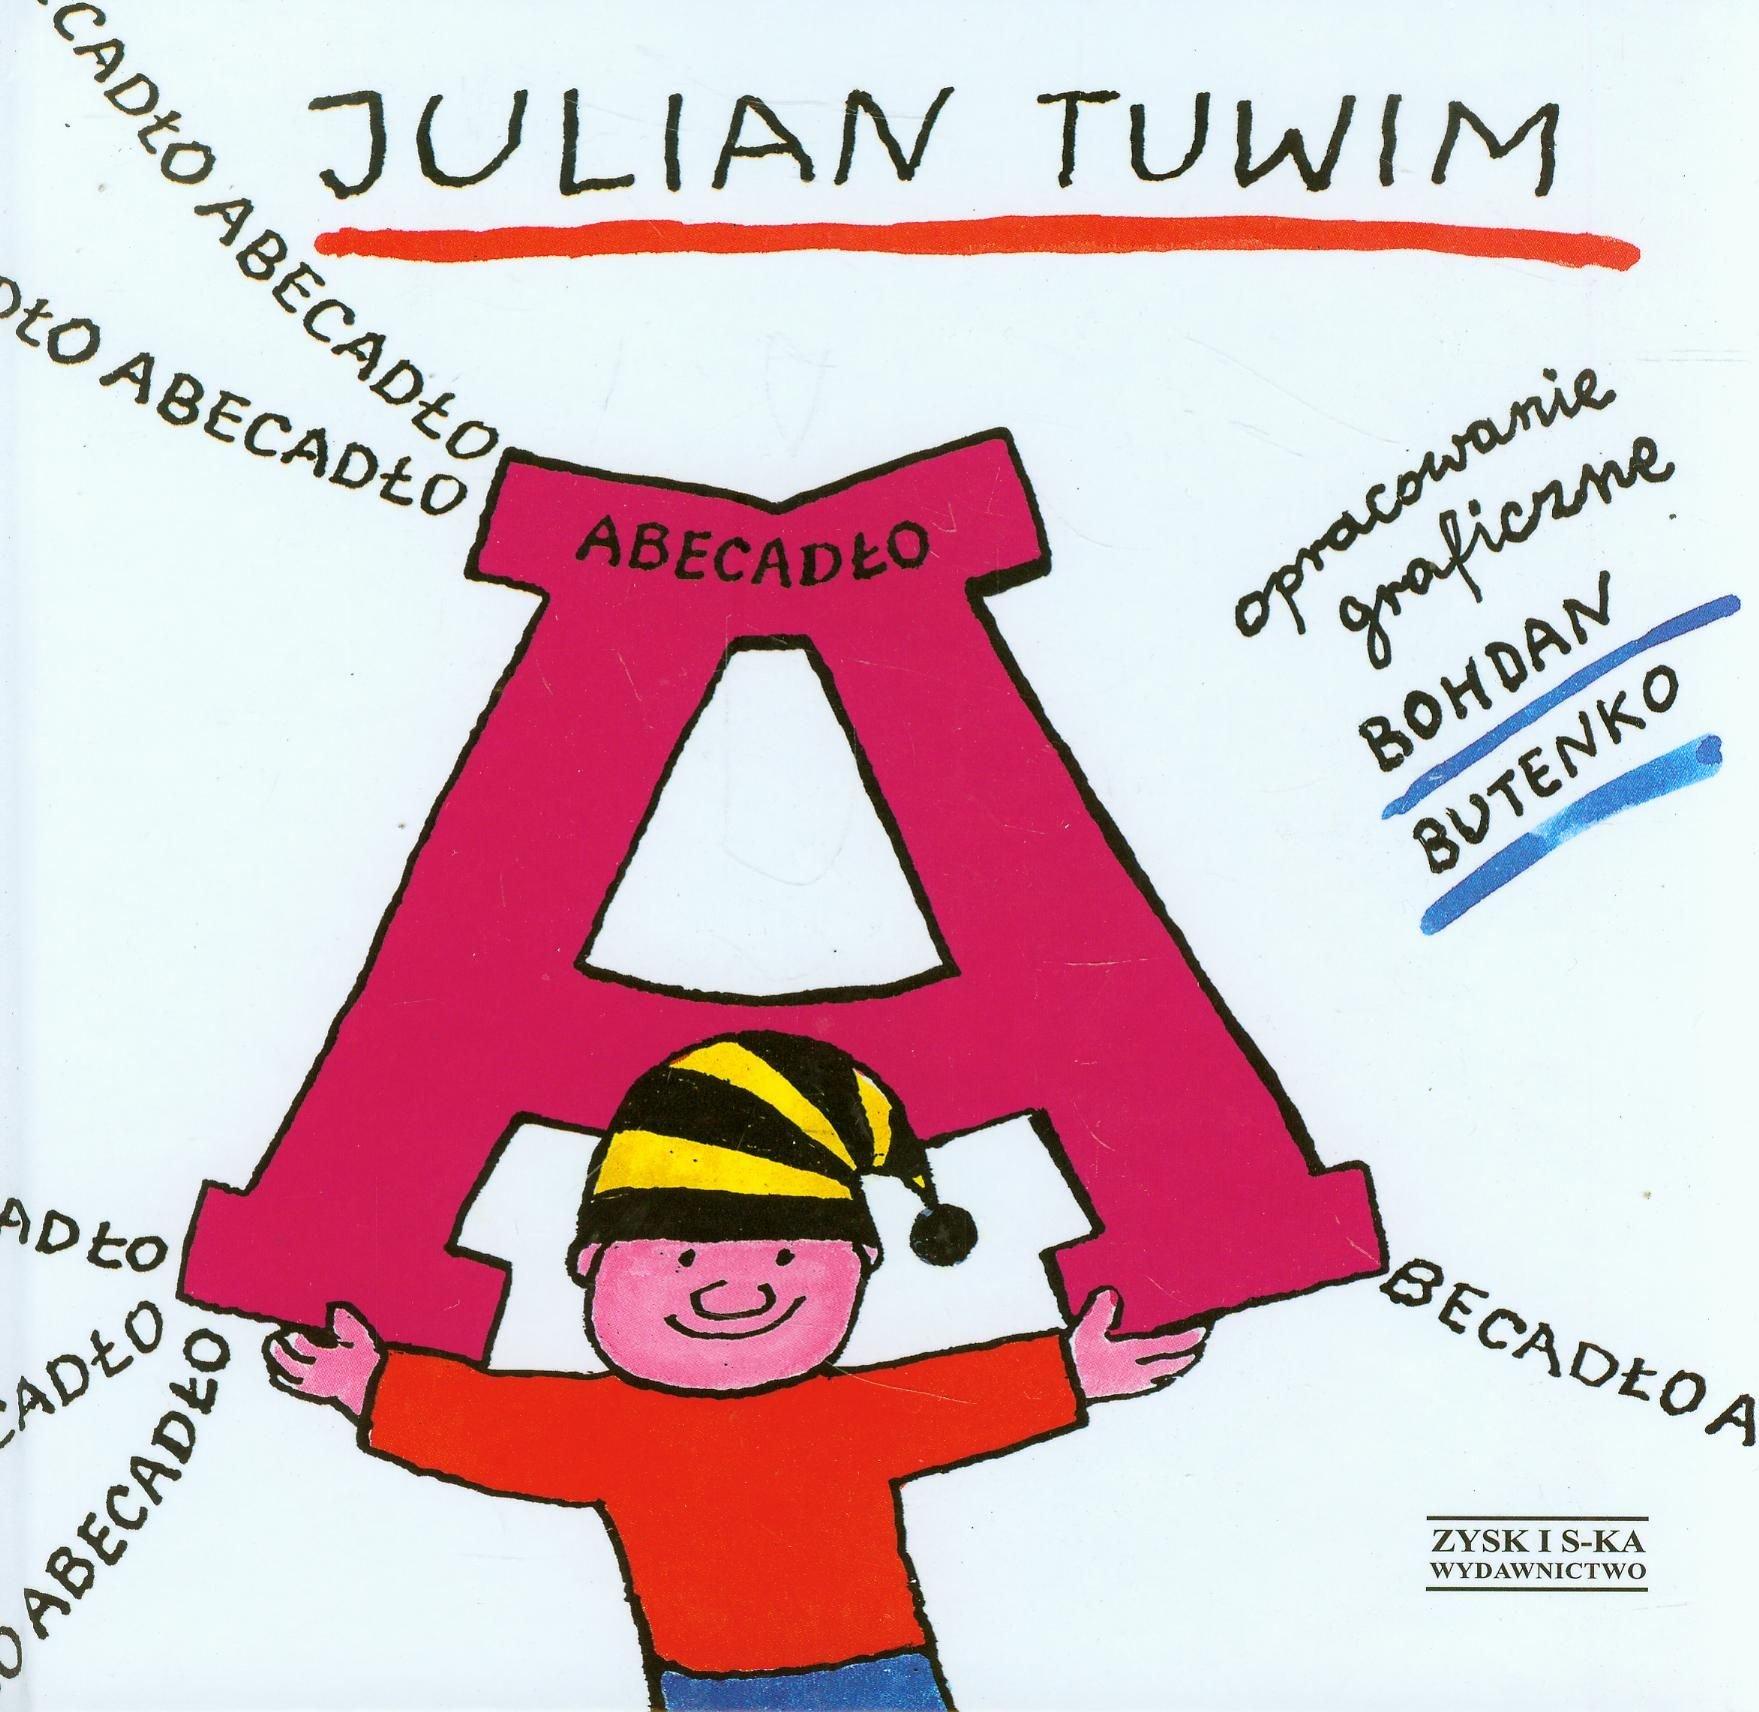 Abecadlo Amazones Julian Tuwim Libros En Idiomas Extranjeros